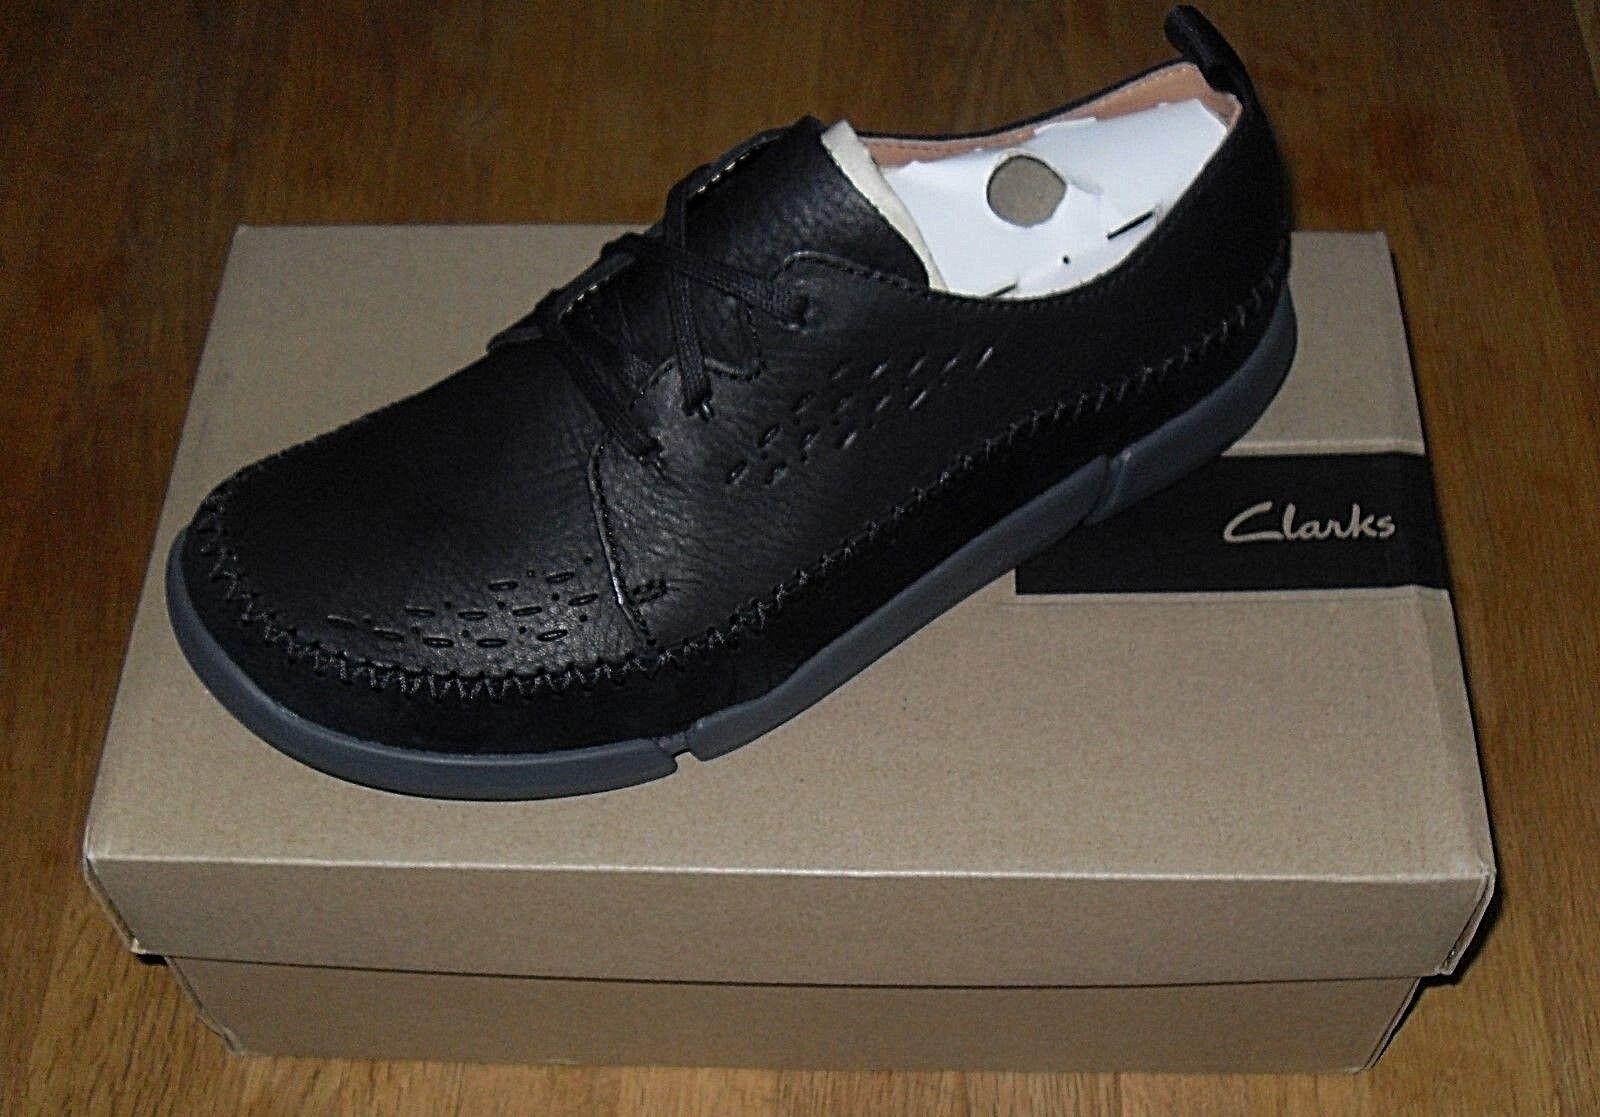 Clarks Trifri Lace Black Leather Mens shoes Size UK 8